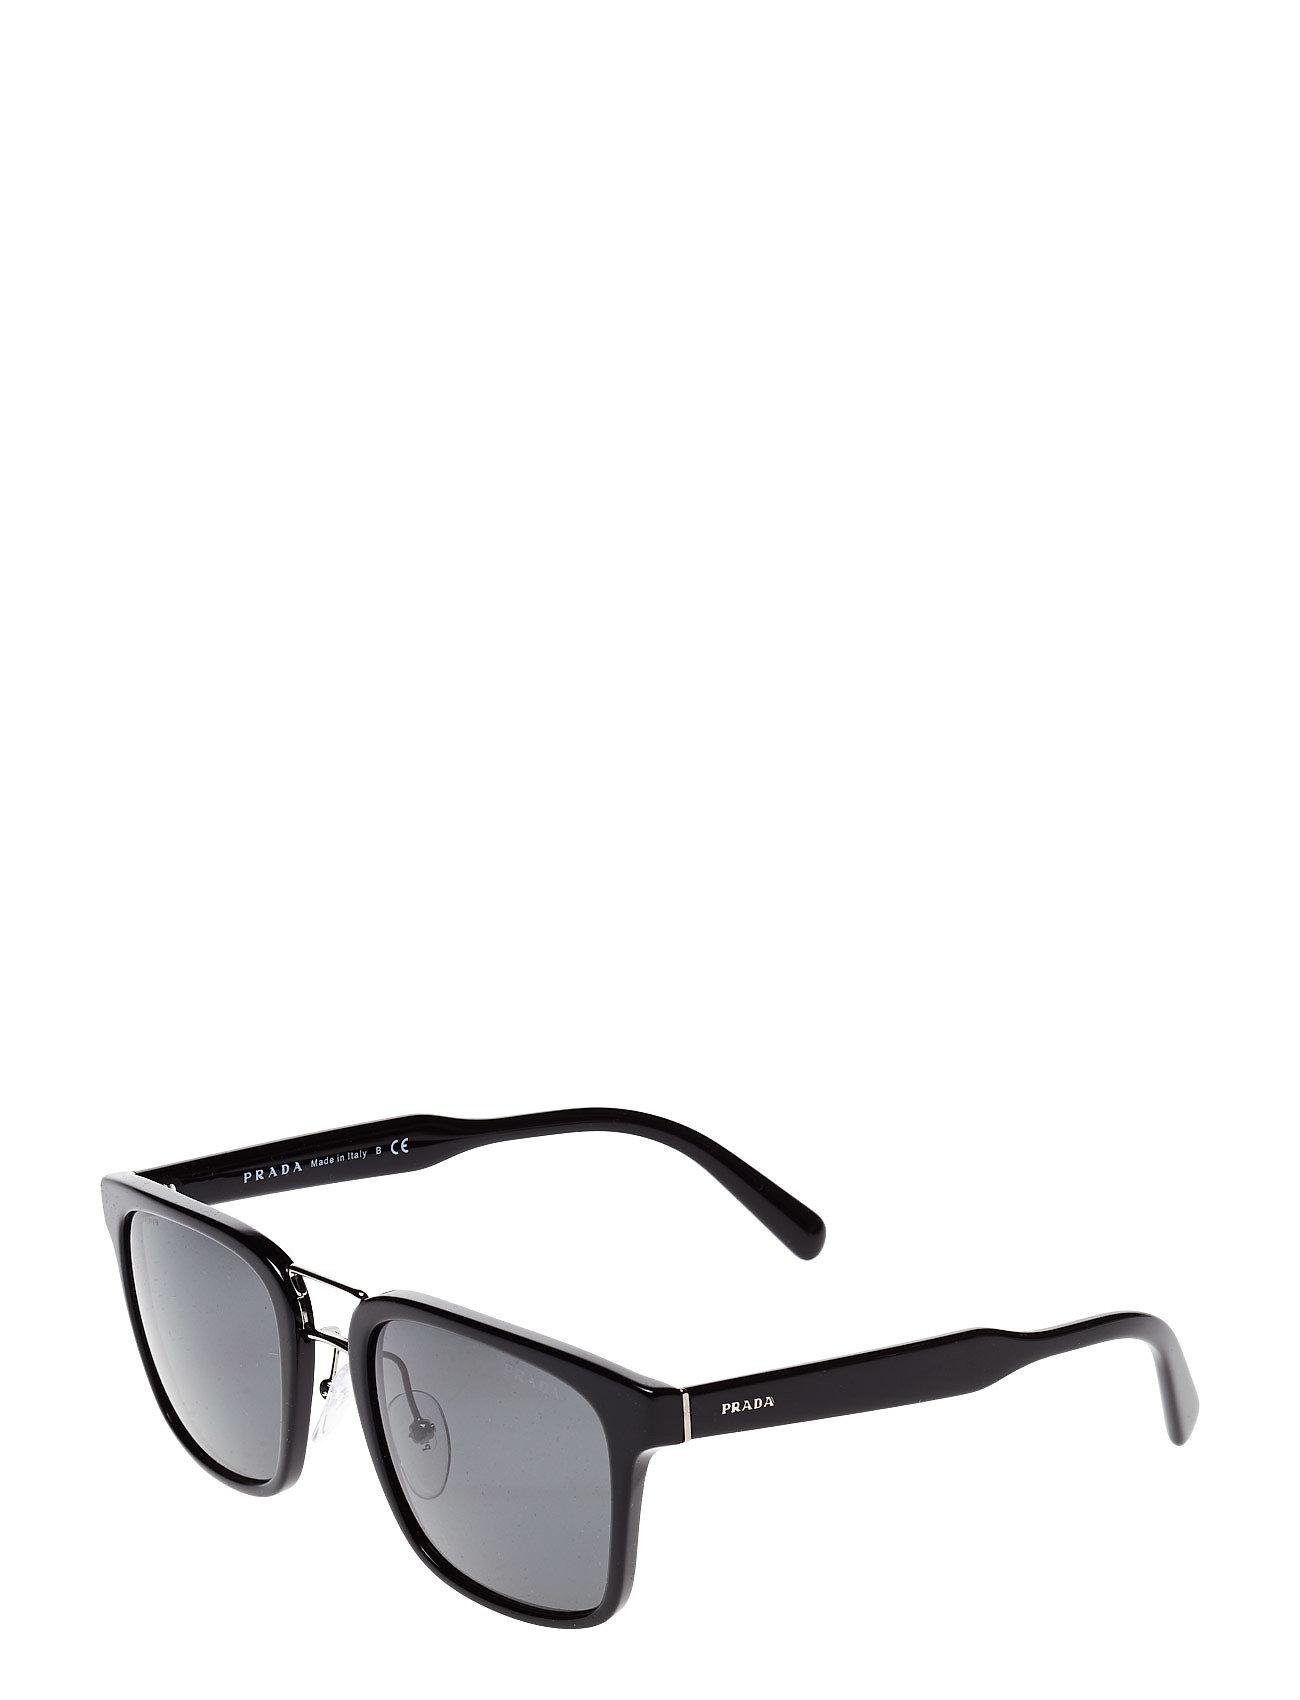 D Frame Wayfarer Solbriller Sort PRADA SUNGLASSES